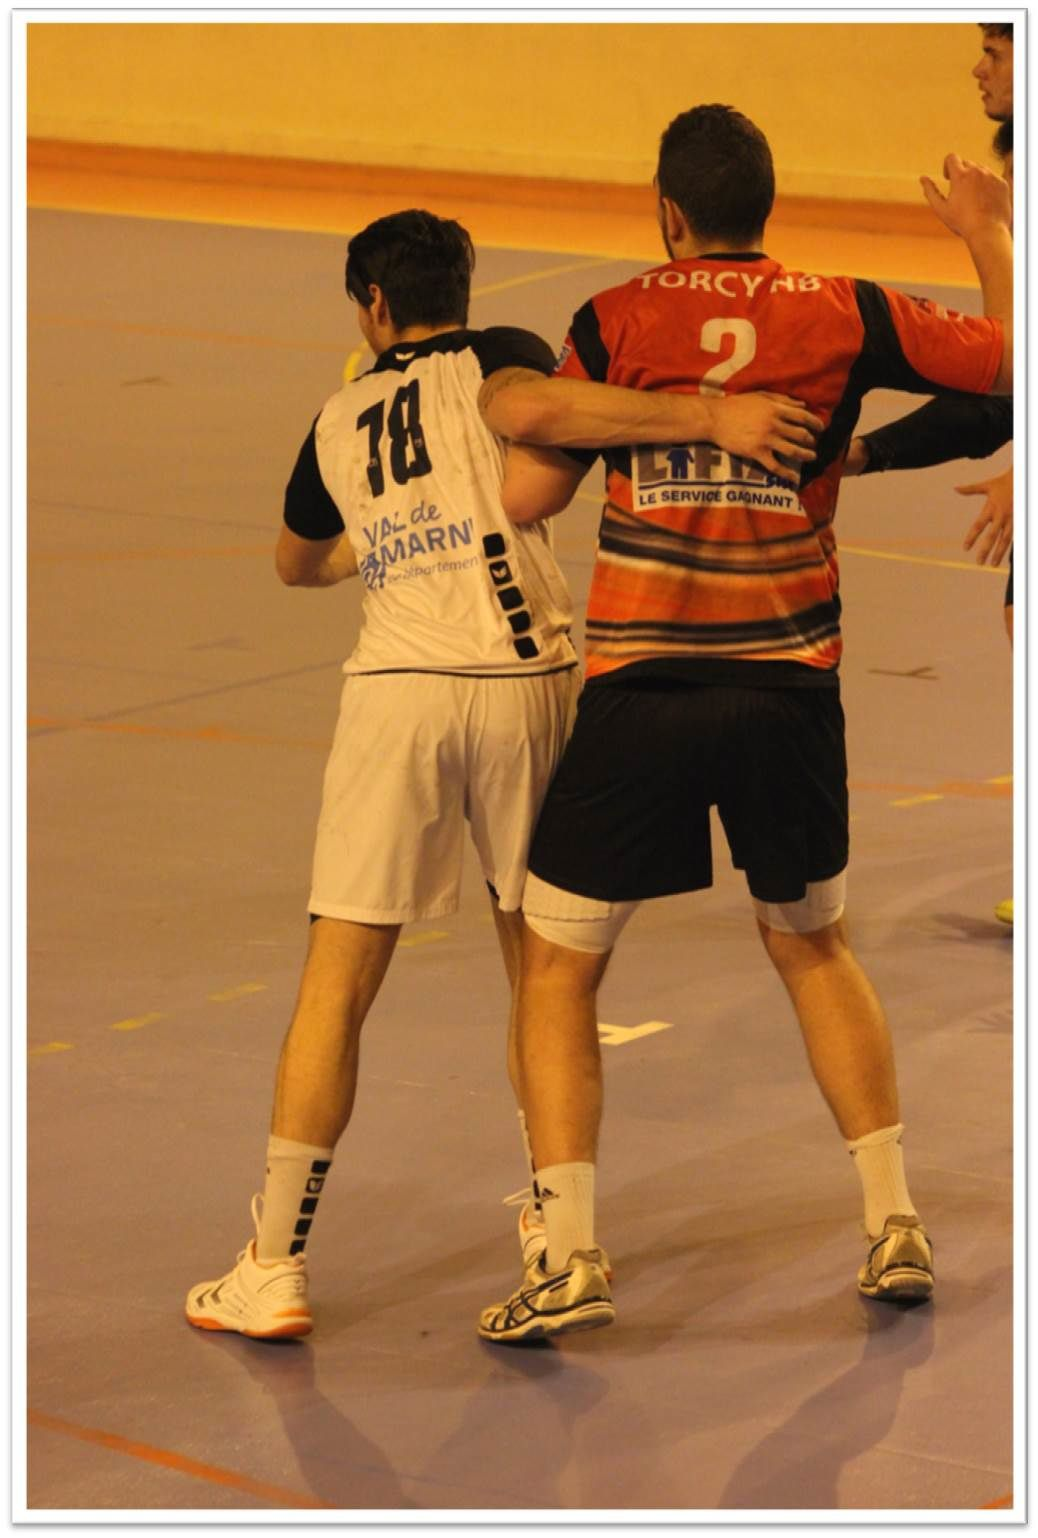 THBMLV vs IVRY (Coupe Séniors LIFE) 30.03.2016